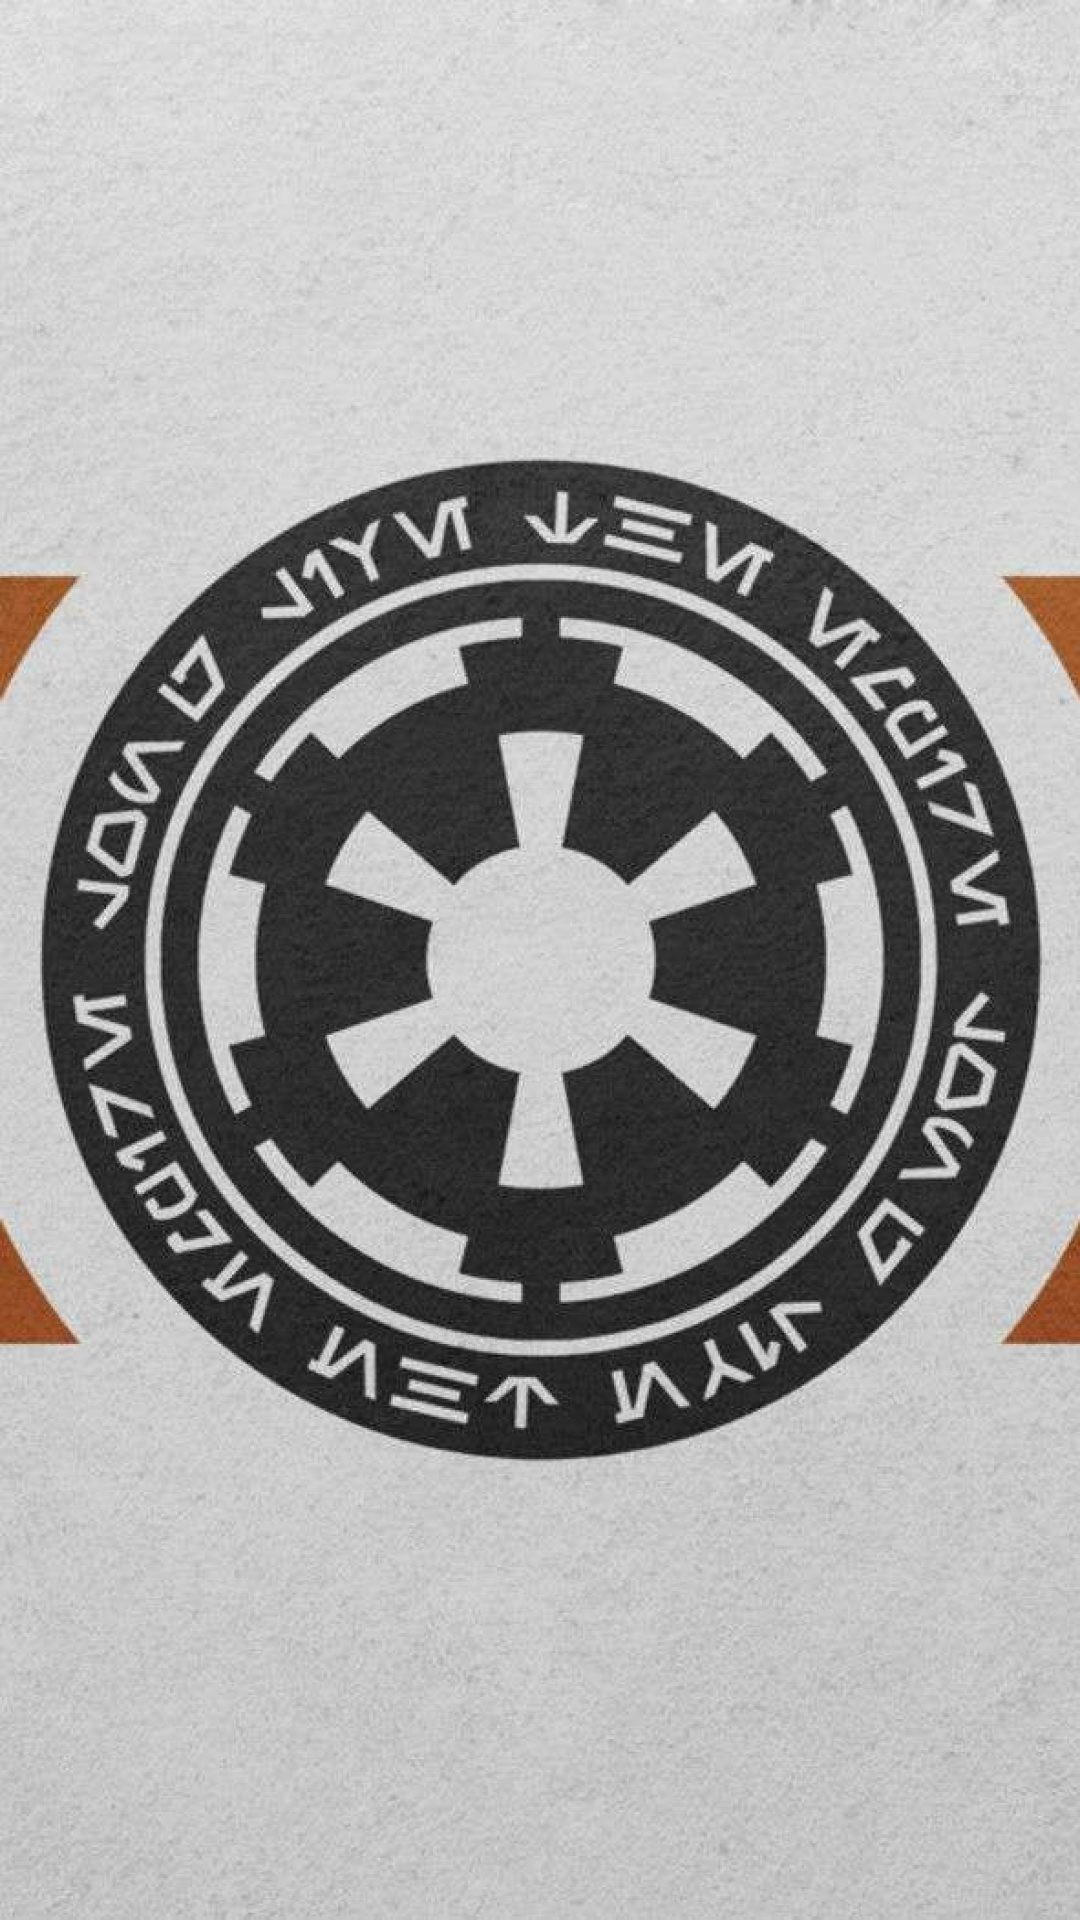 star wars empire wallpaper hd